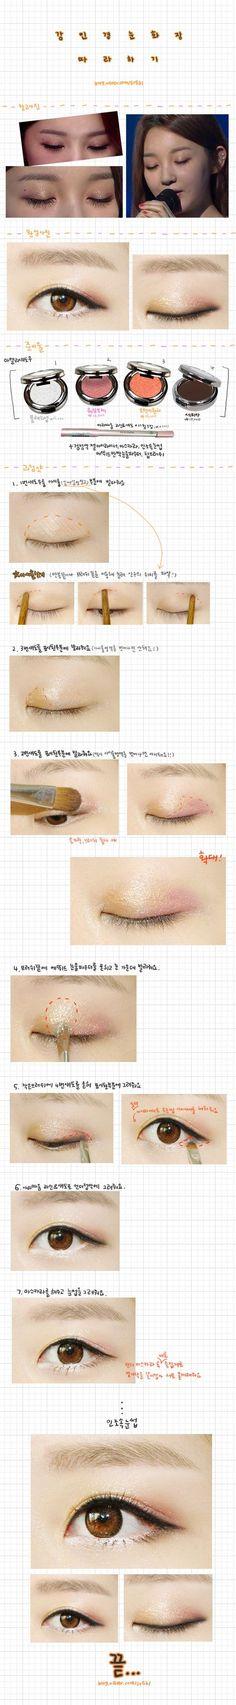 Korean make up Korean Wedding Makeup, Korean Make Up, Wedding Make Up, Ulzzang, Makeup Looks, Personal Style, Cool Outfits, Style Inspiration, Kpop